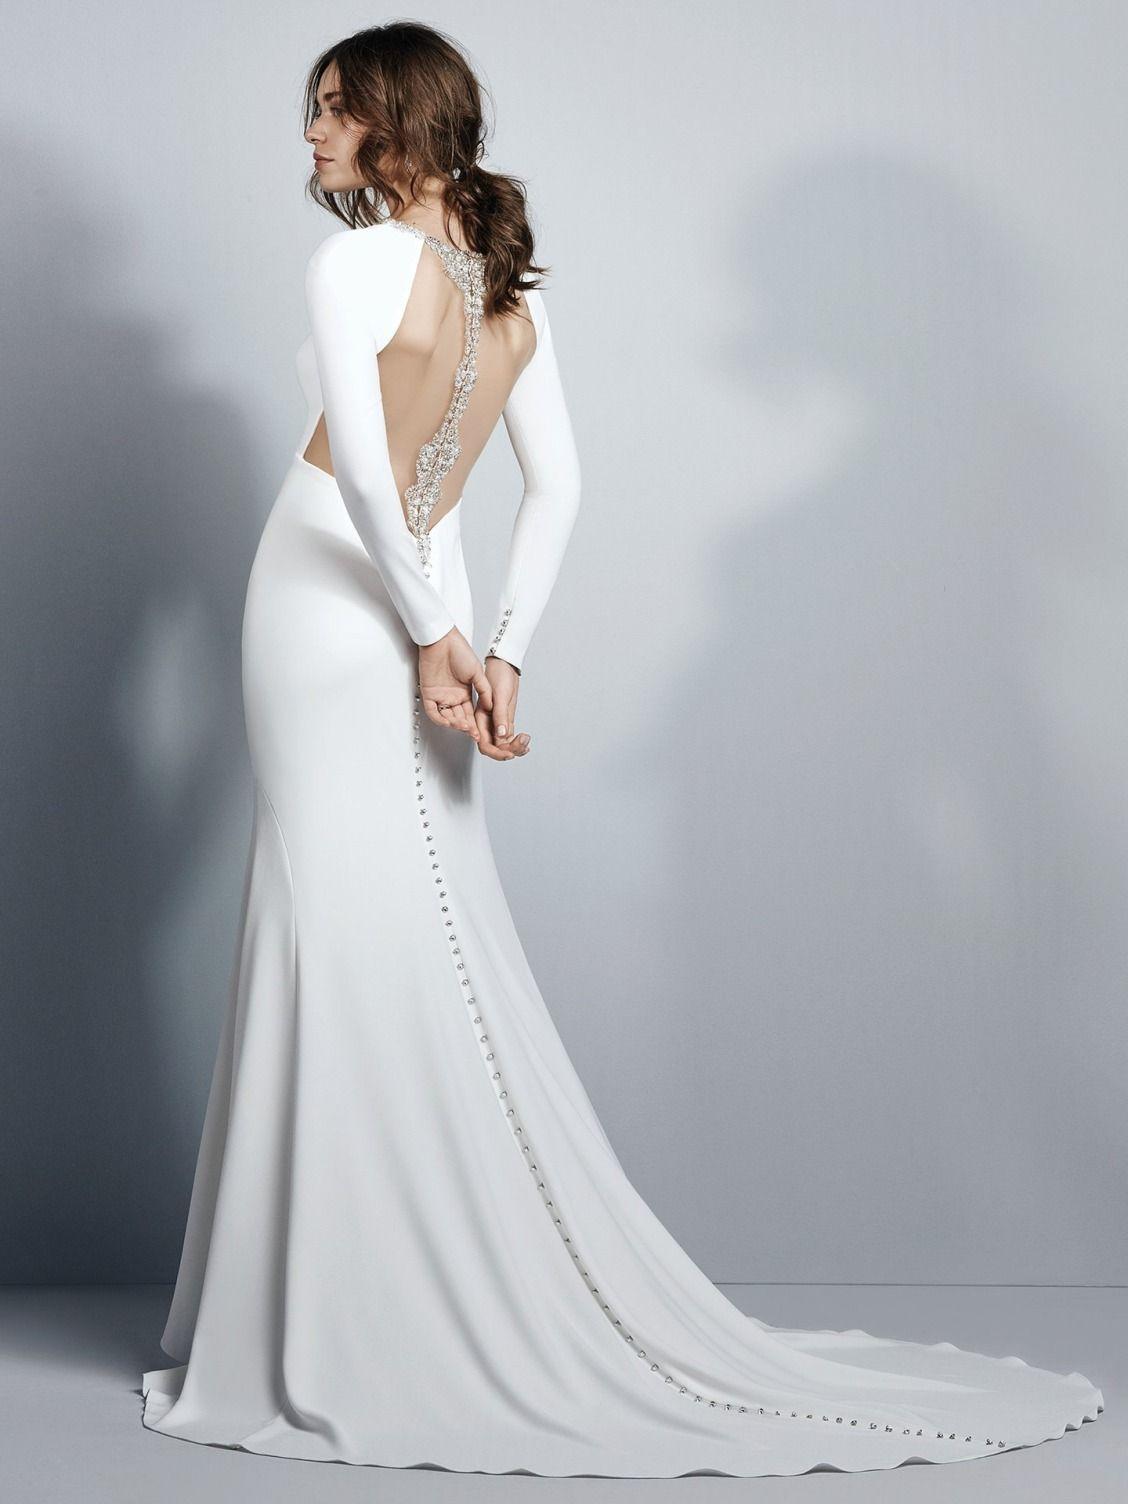 ... crepe sheath wedding dress evokes Old Hollywood glamour 99fd25e2d203